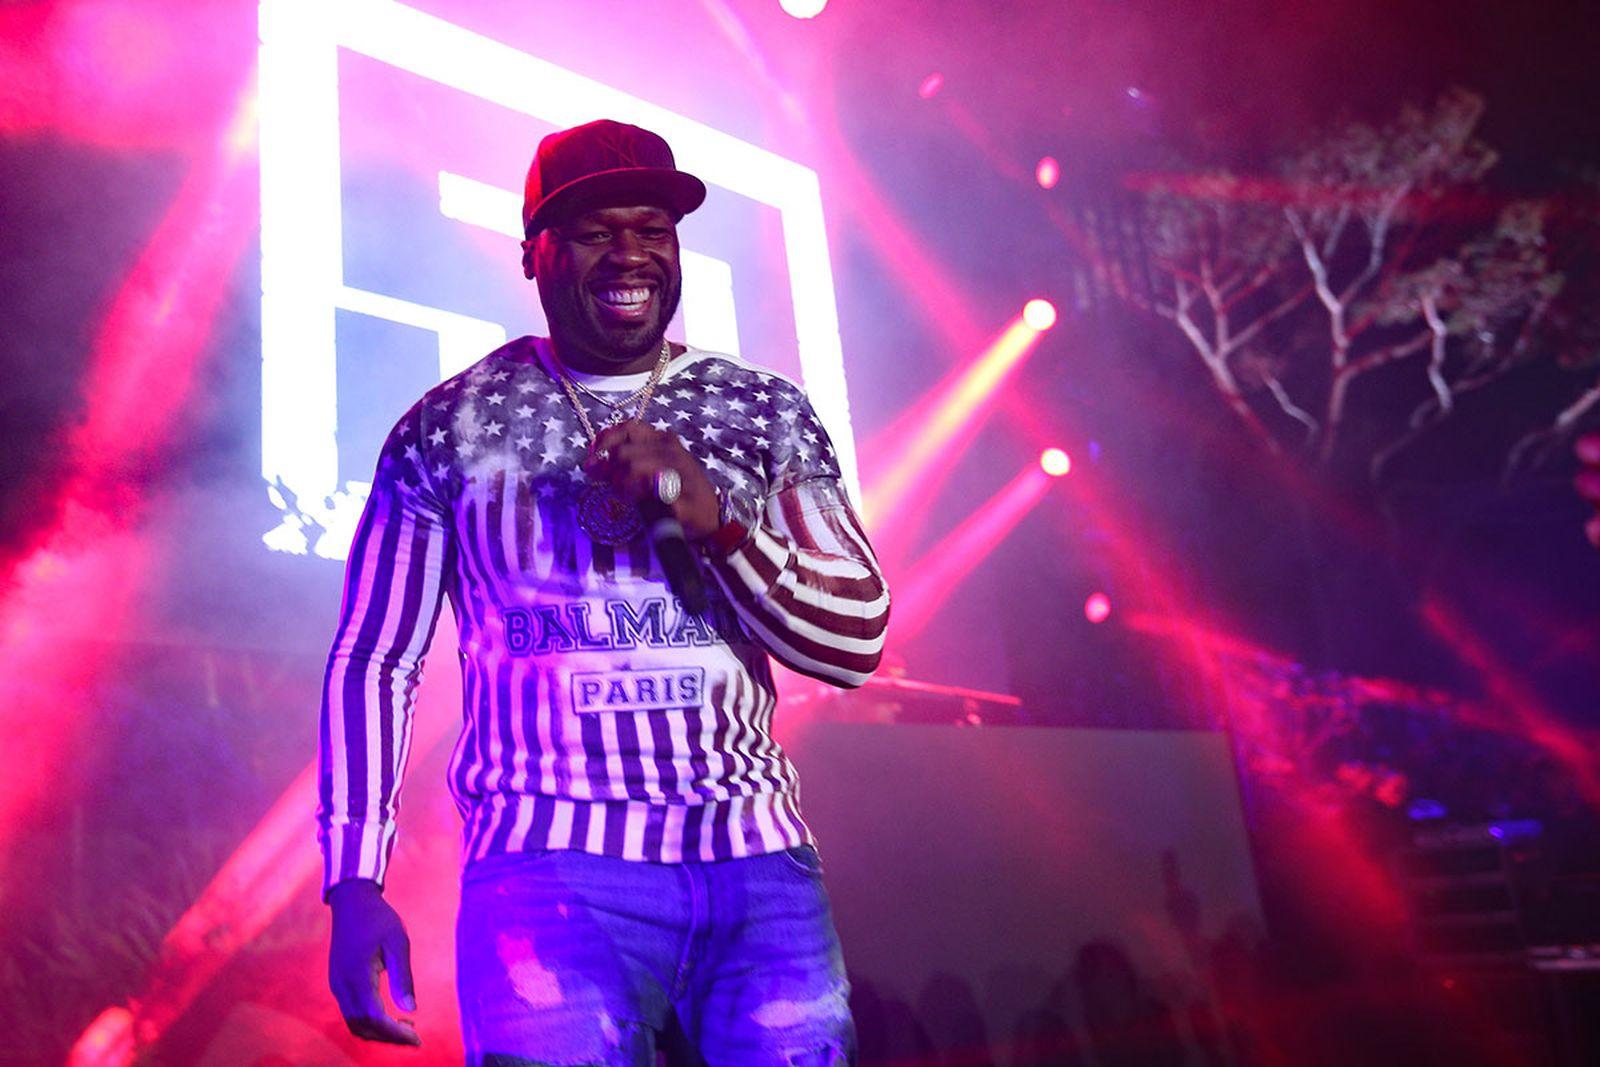 50 cent feuding rapper